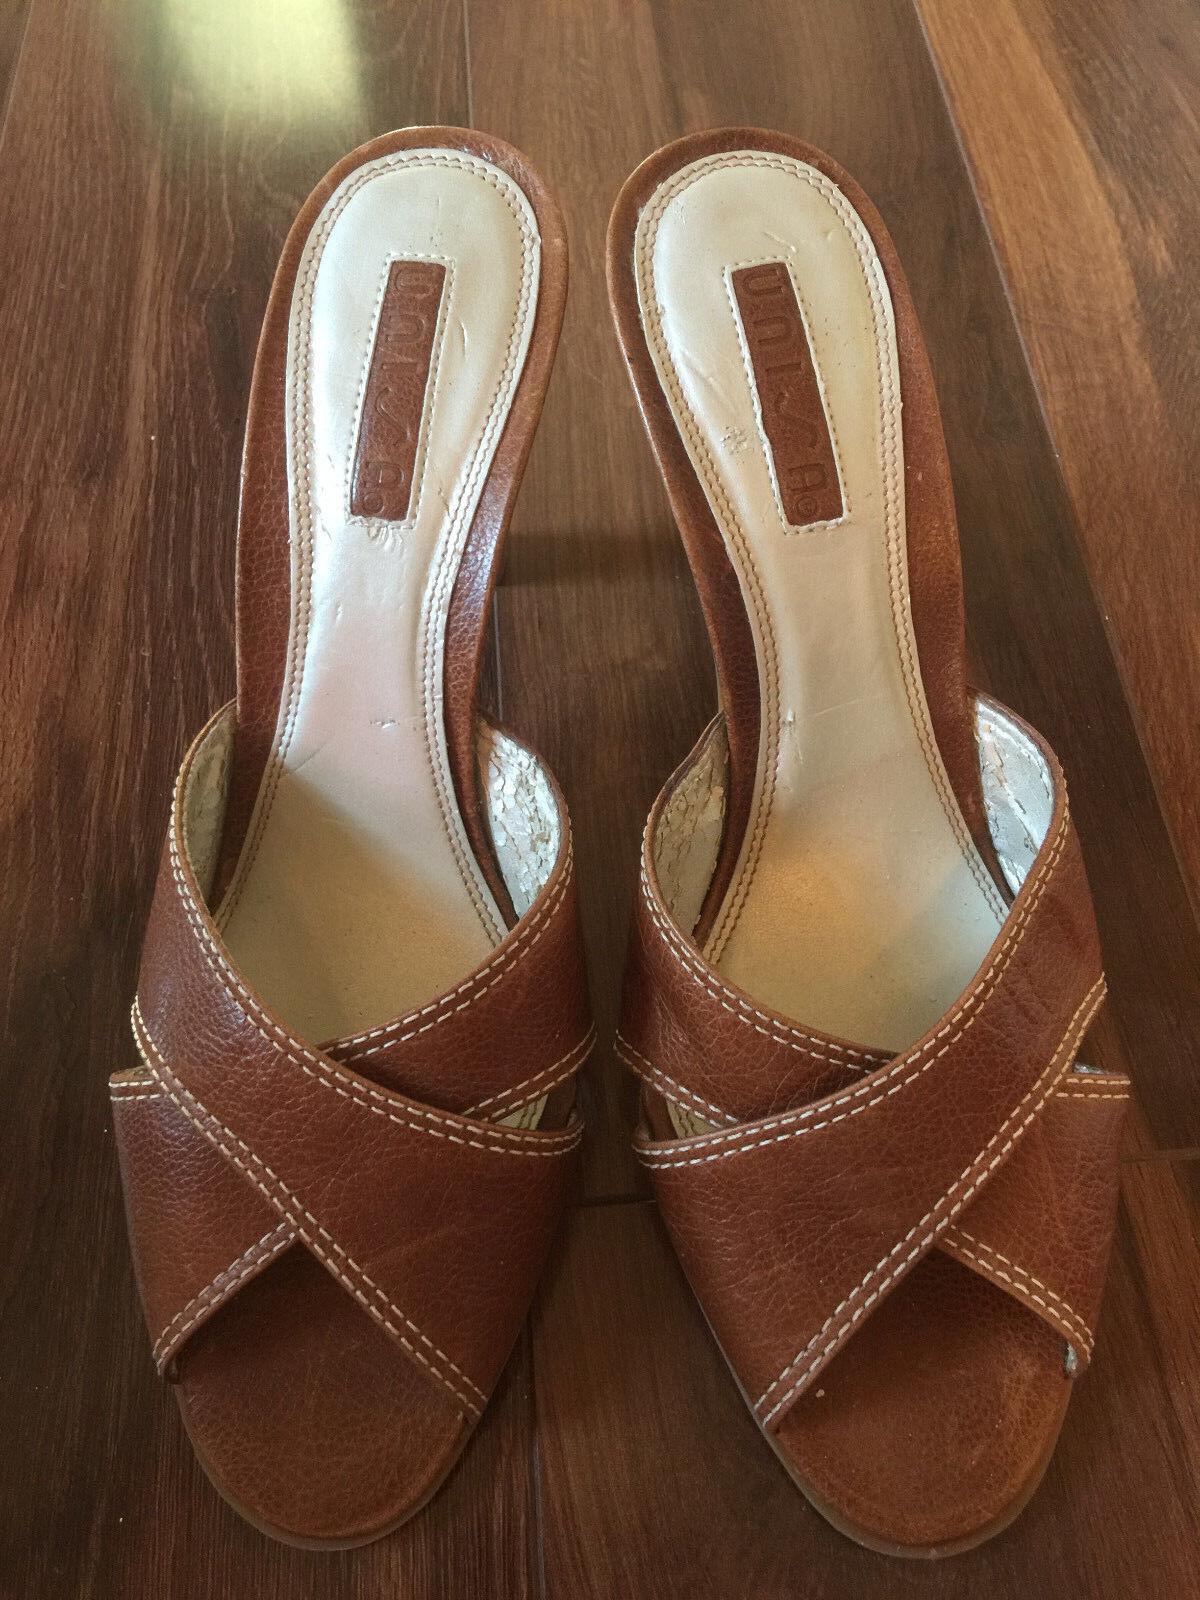 NEW ladies MEDIUM UNISA MEDIUM ladies HEEL SANDALS shoes BROWN LEATHER high PEEP TOE size 8.5 6a51b9